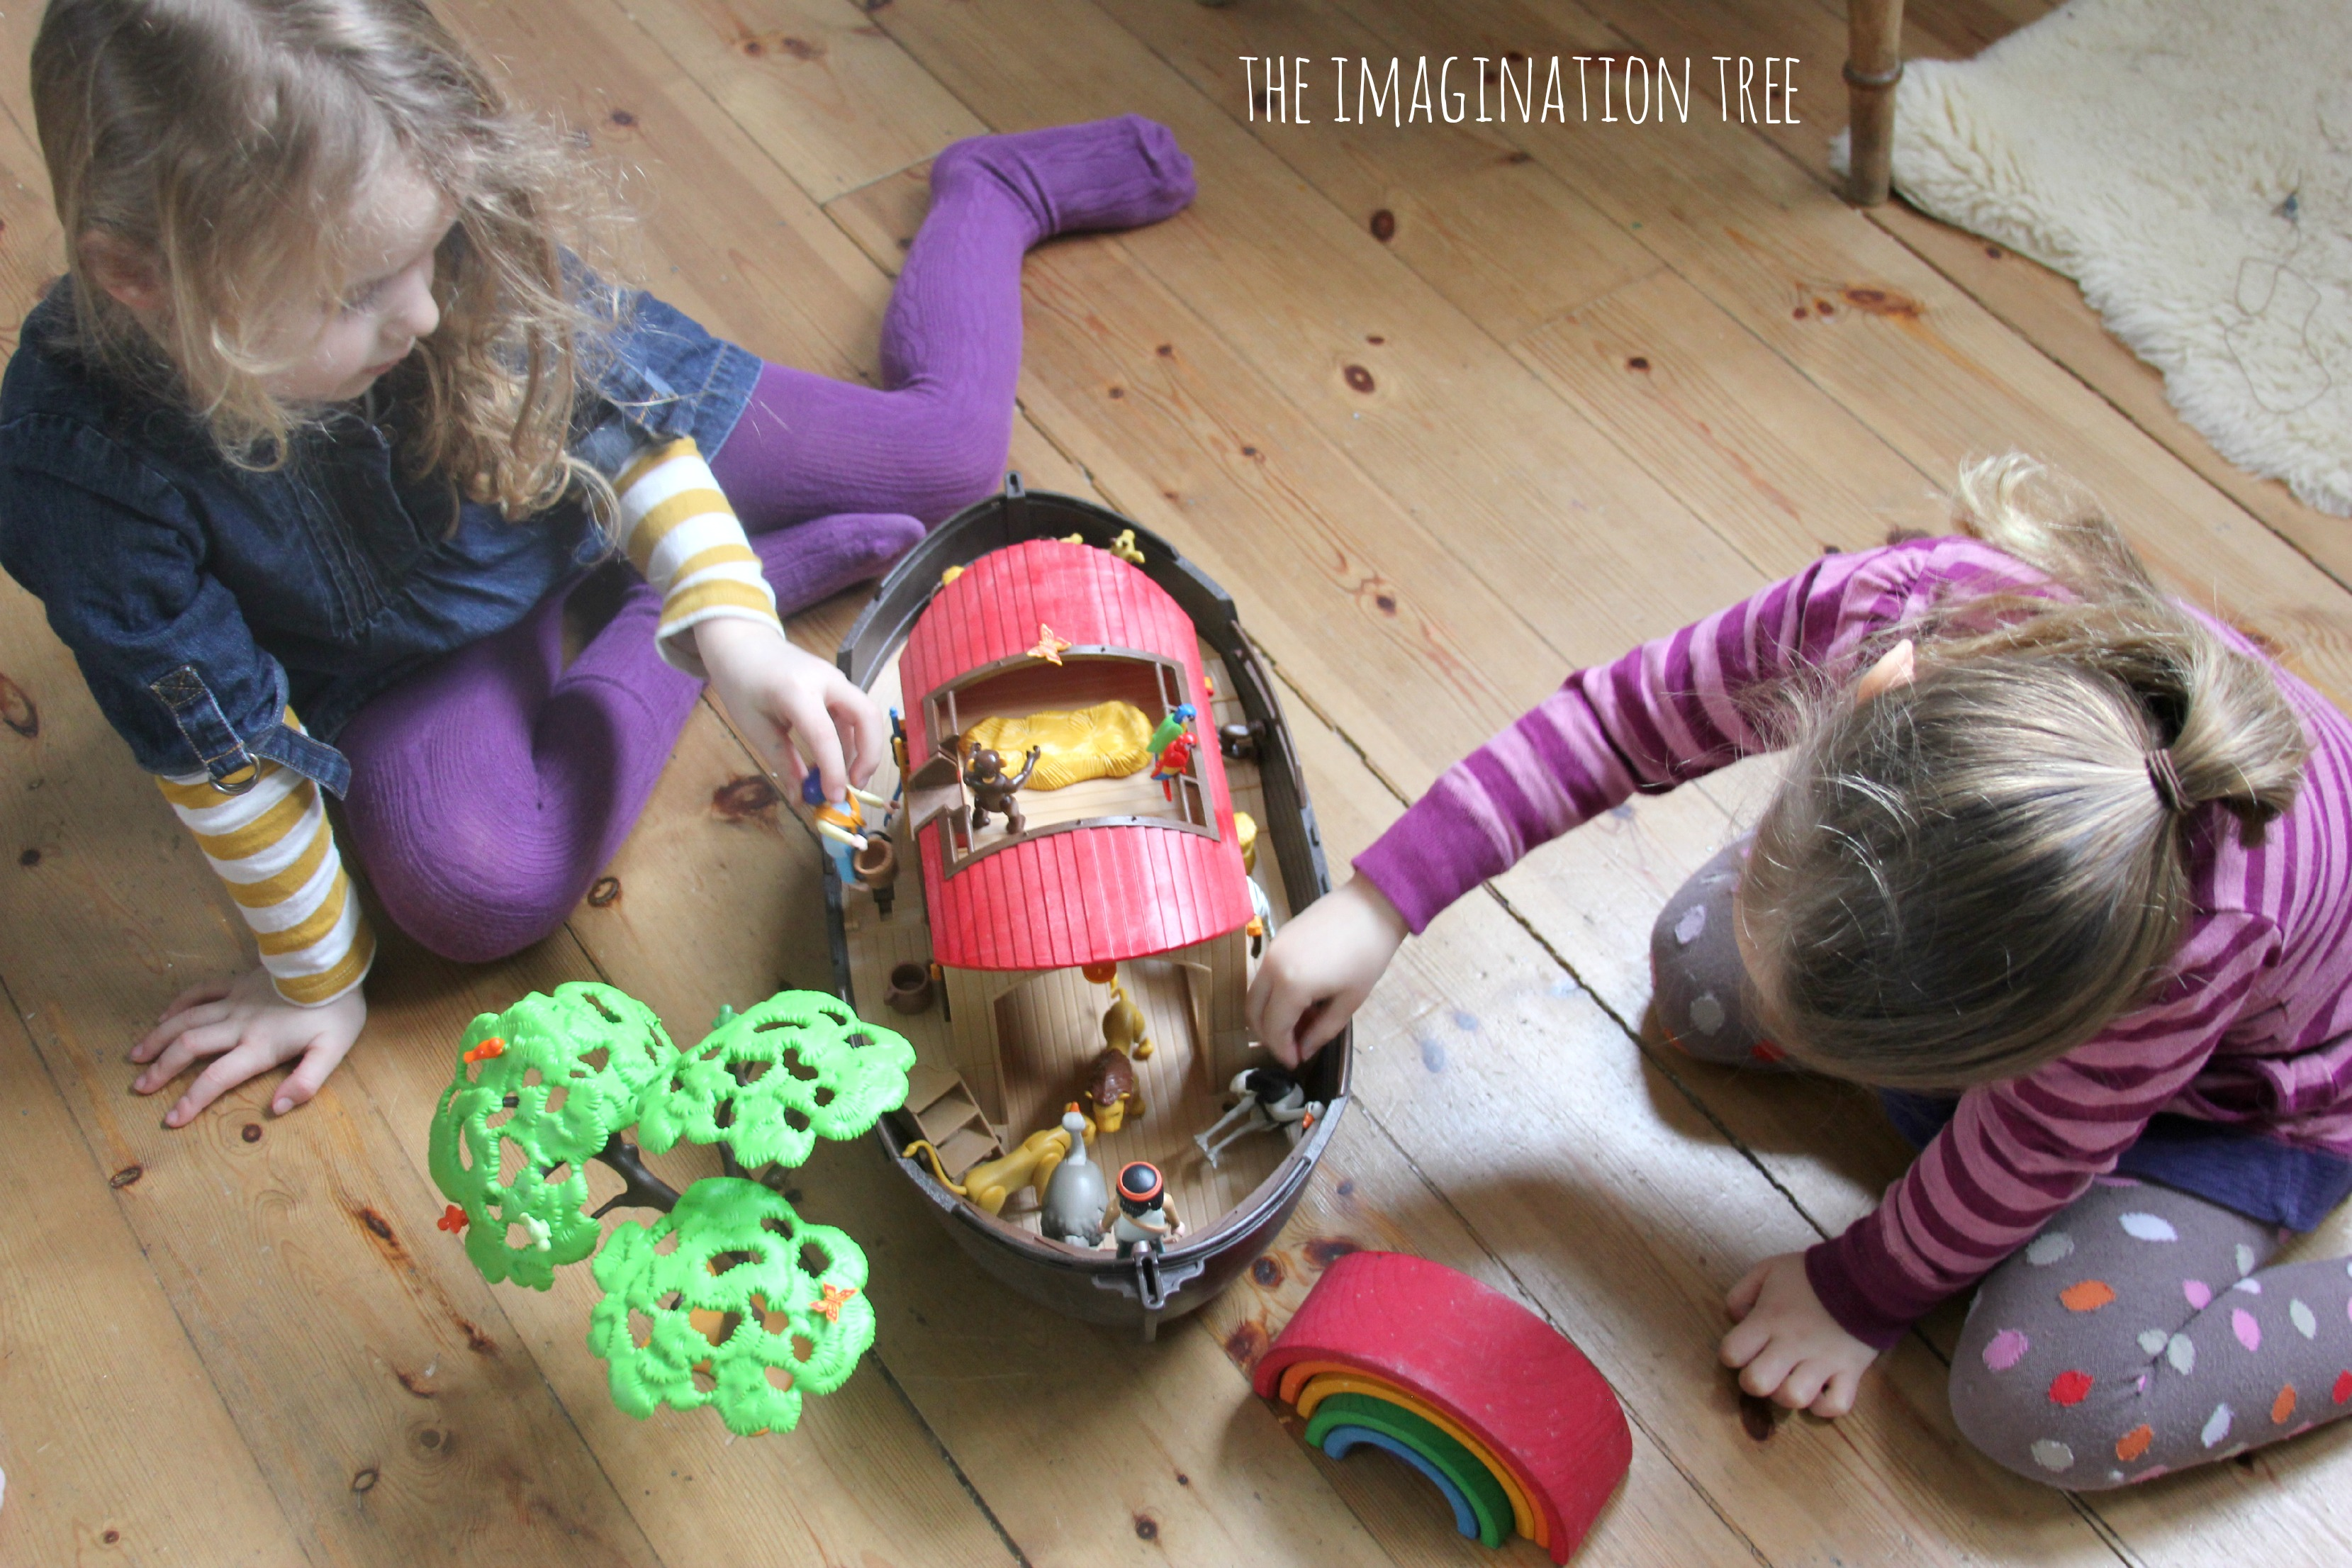 Playmobil Noah's Ark Review - The Imagination Tree